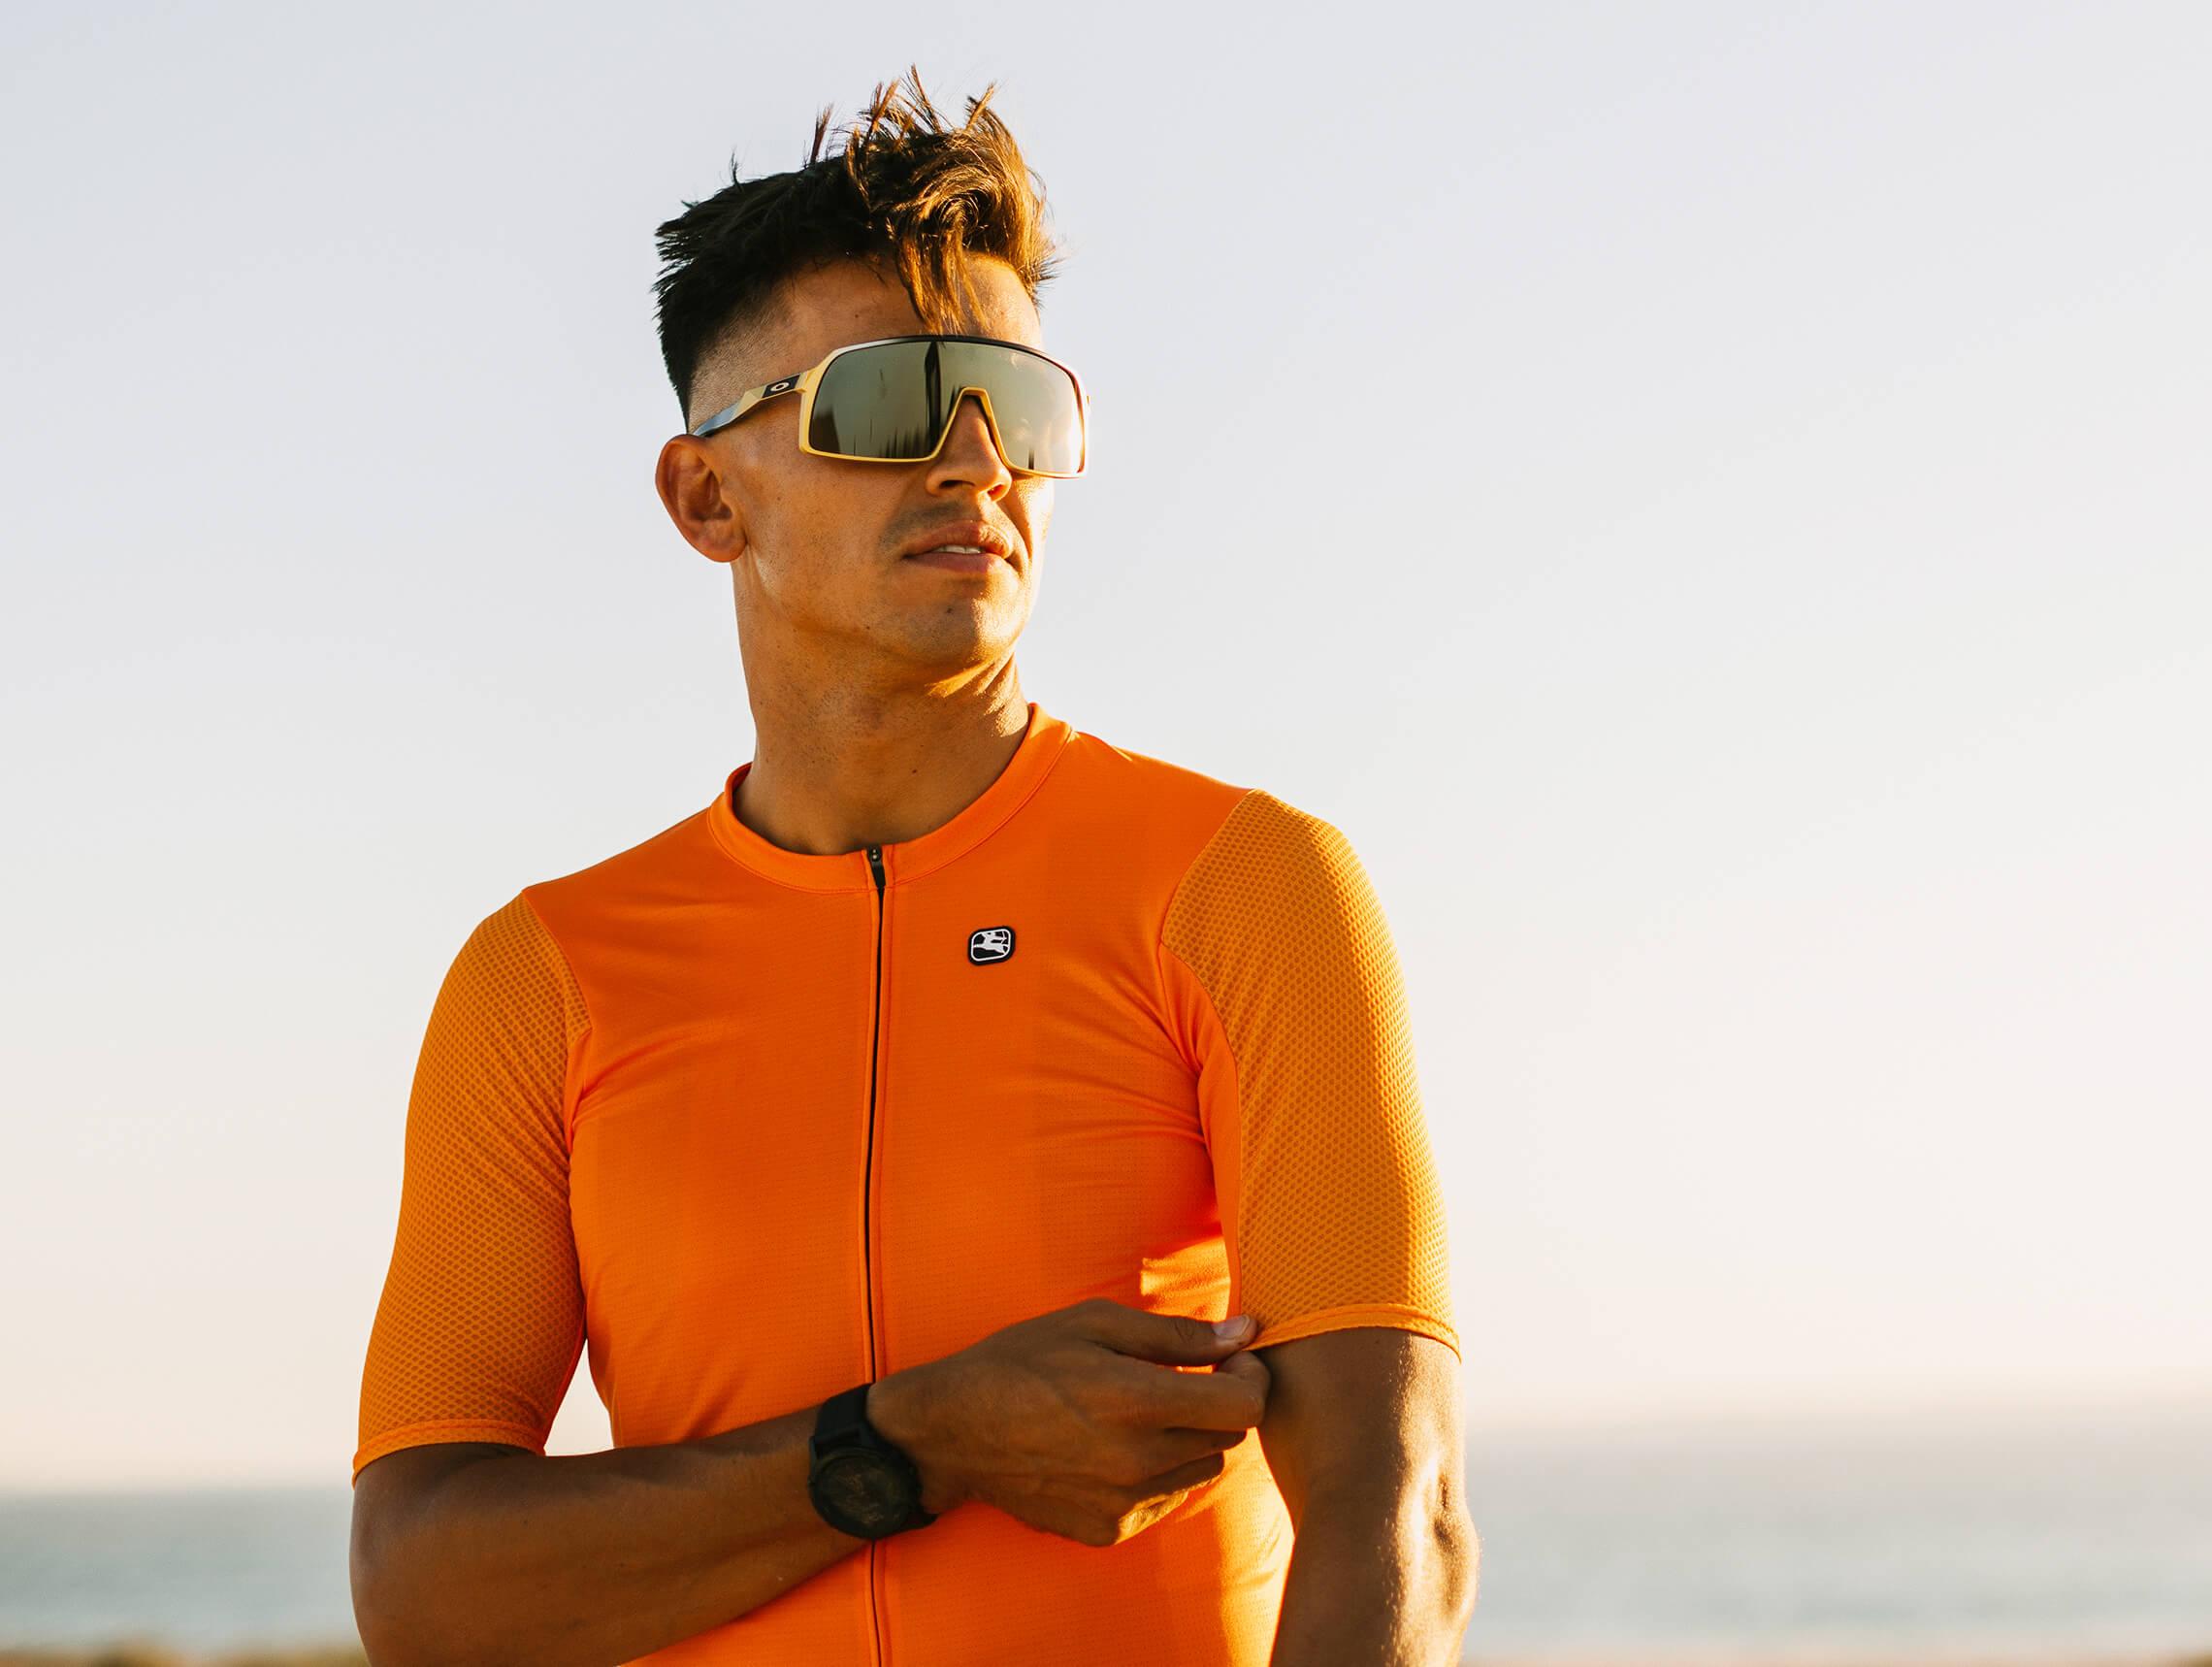 giordana-cycling-ss21-jersey-guide-men-silverline-1